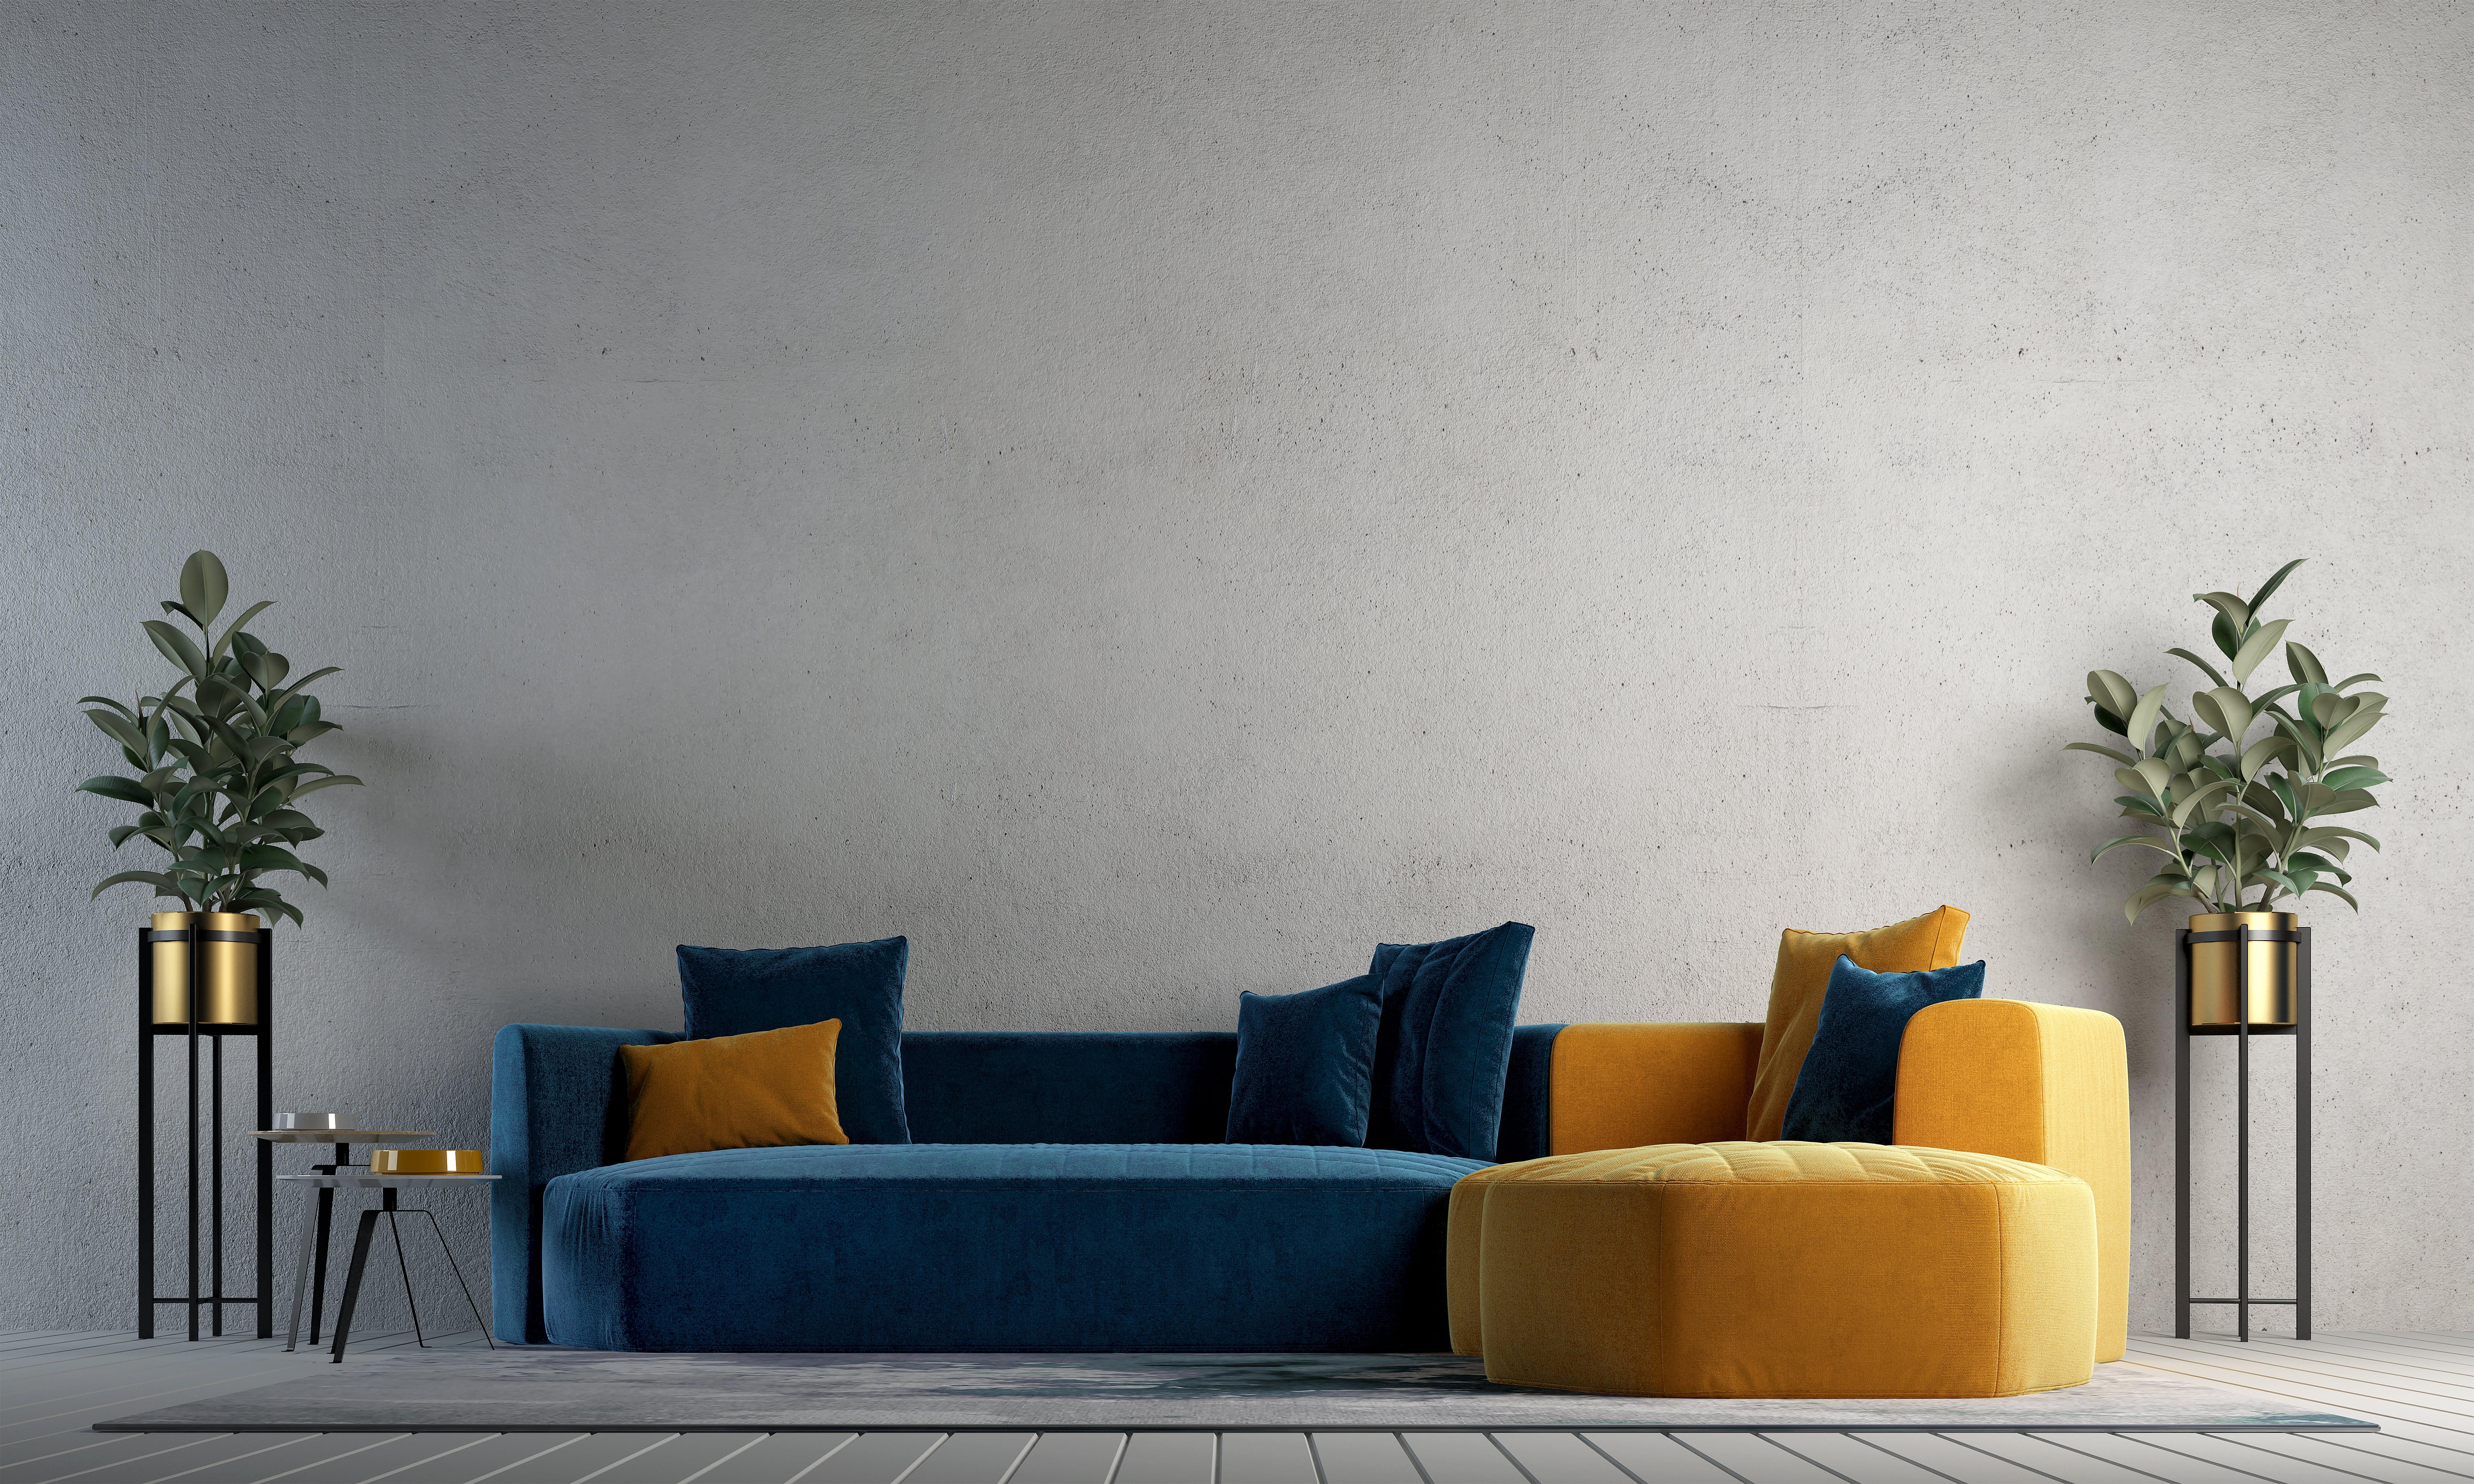 2-maison-corbeil_installation_automne2014_5-1500x1000